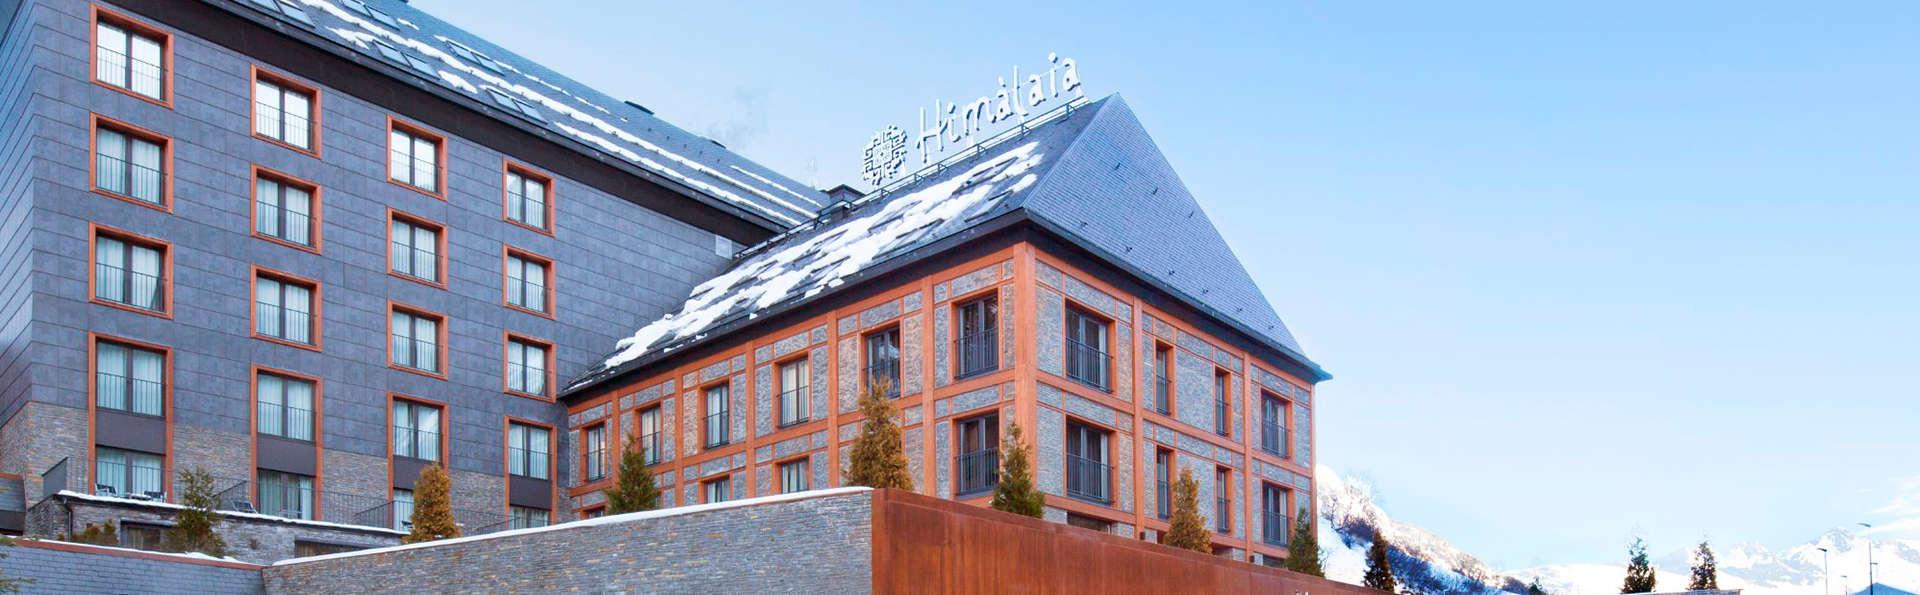 Hotel Himalaia Baqueira by Pierre & Vacances Premium - EDIT_front.jpg